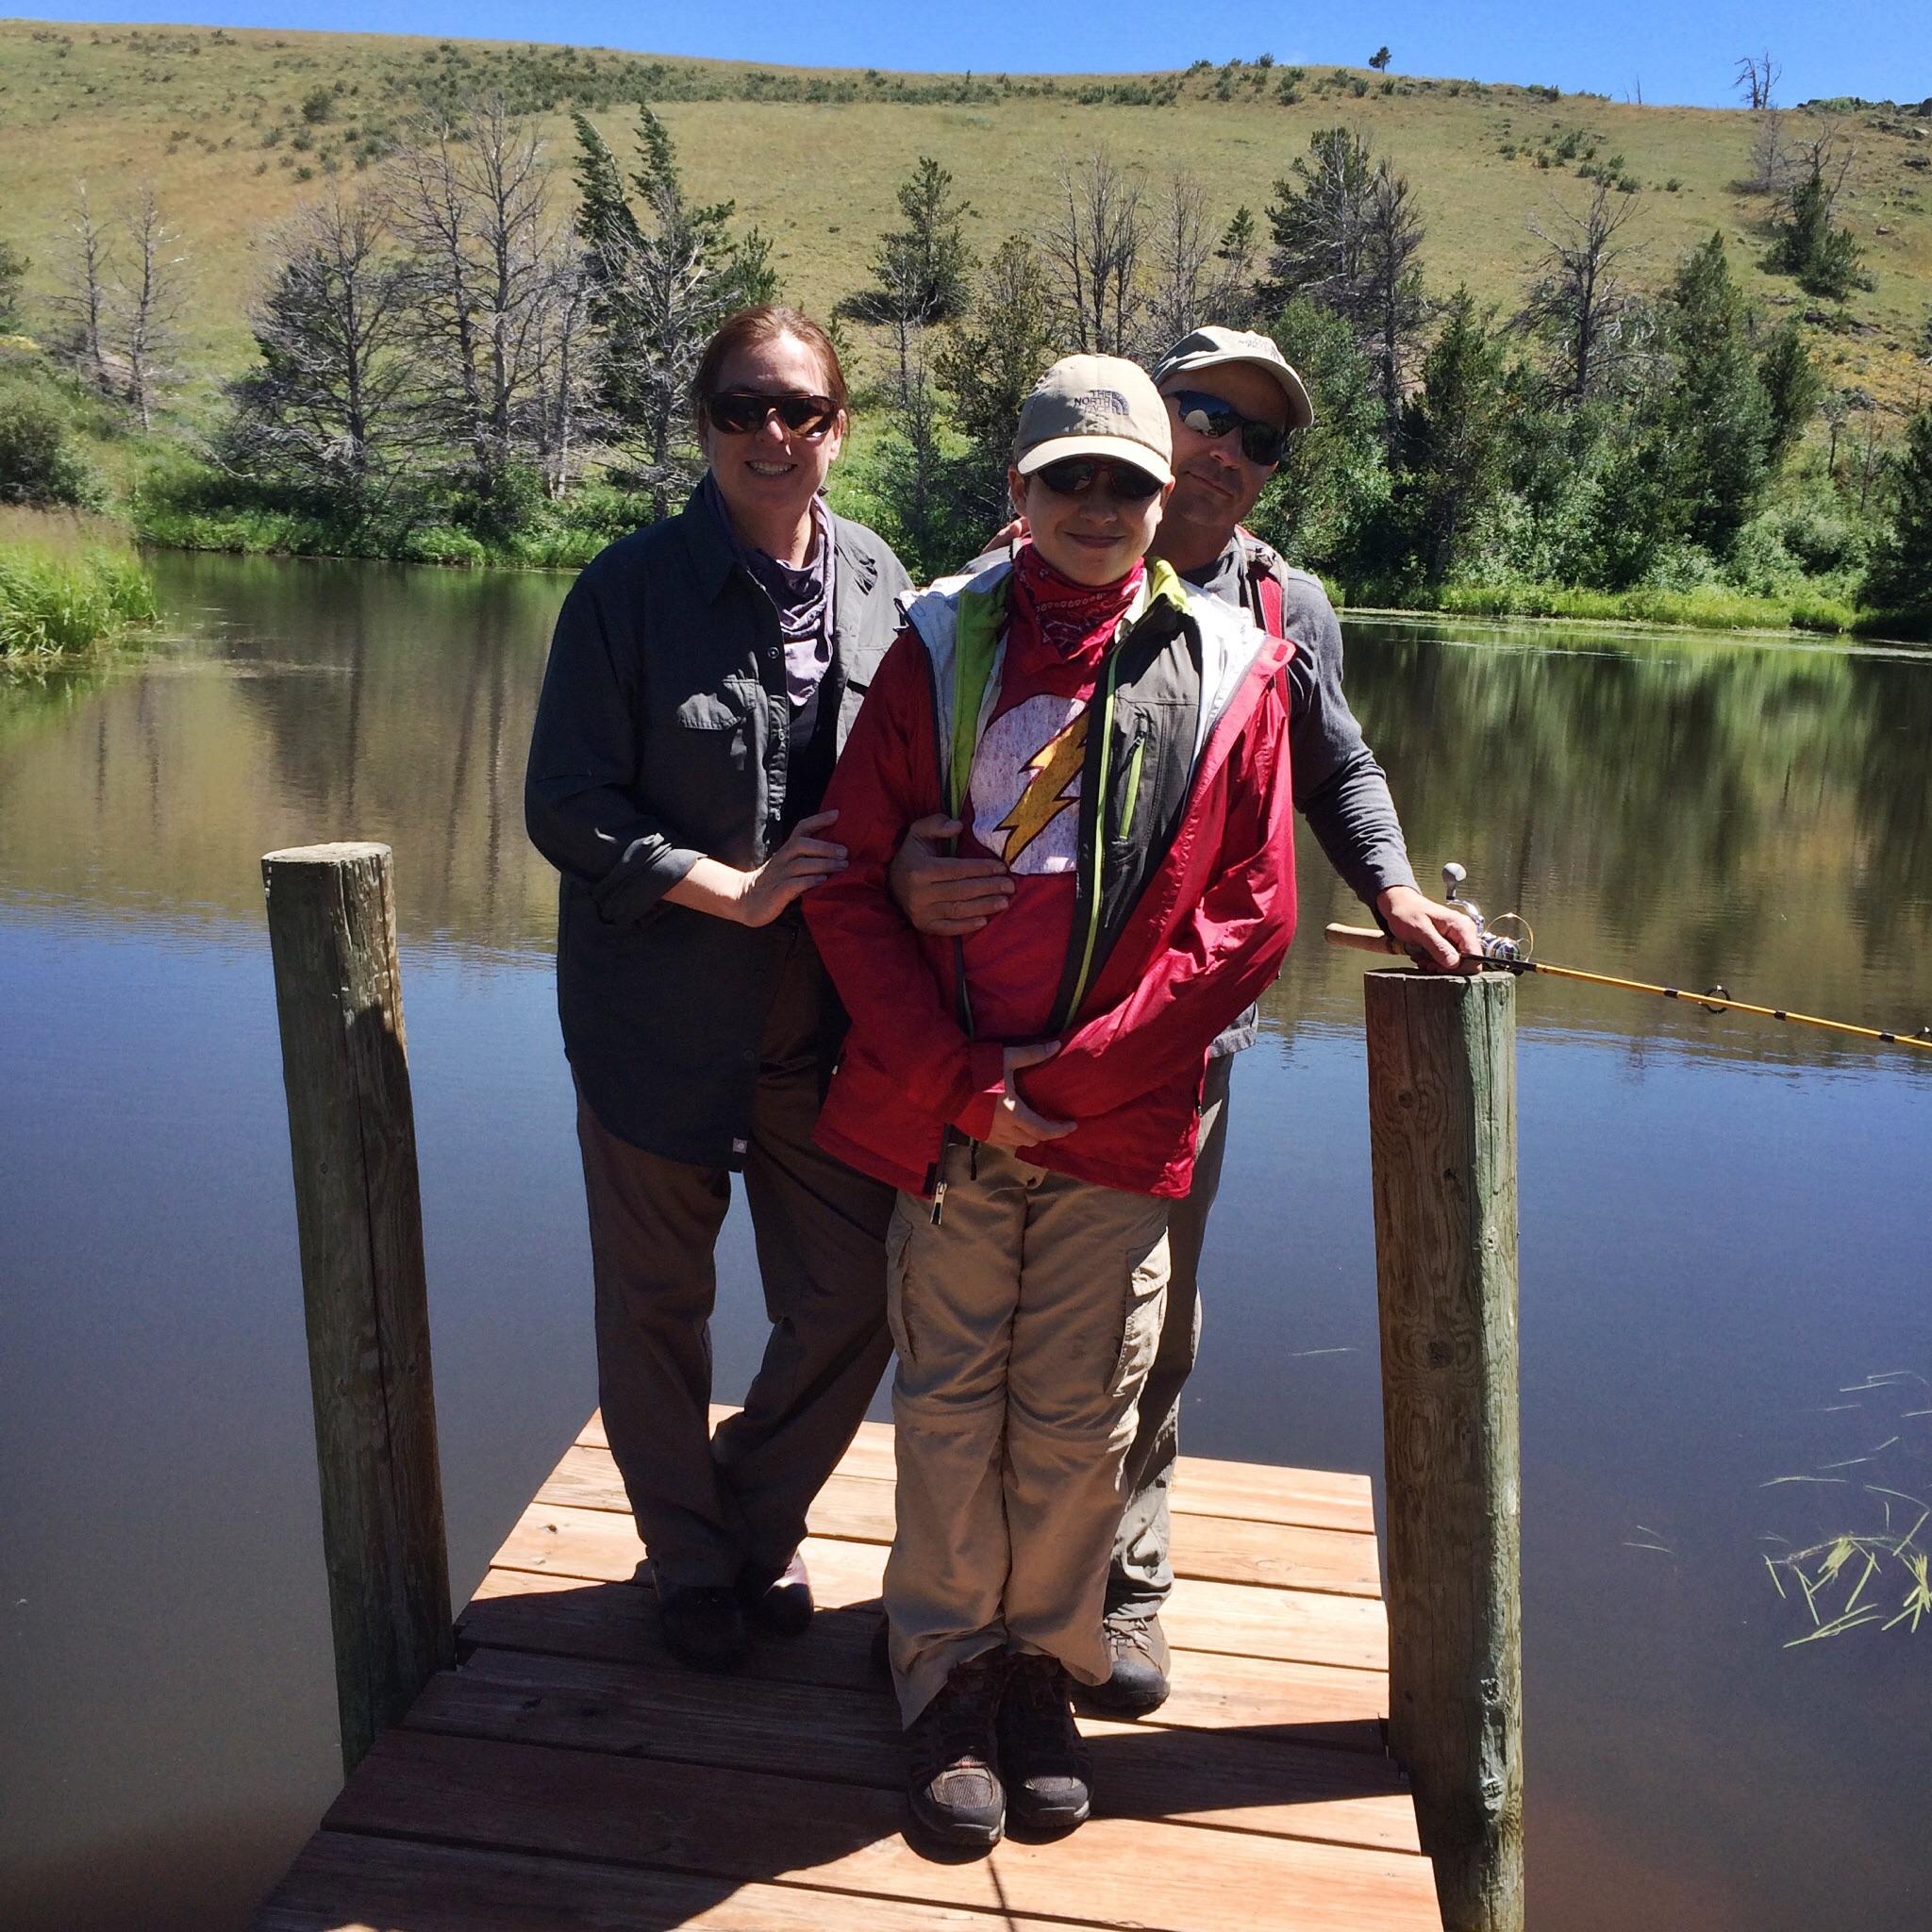 Fishing at the big pond